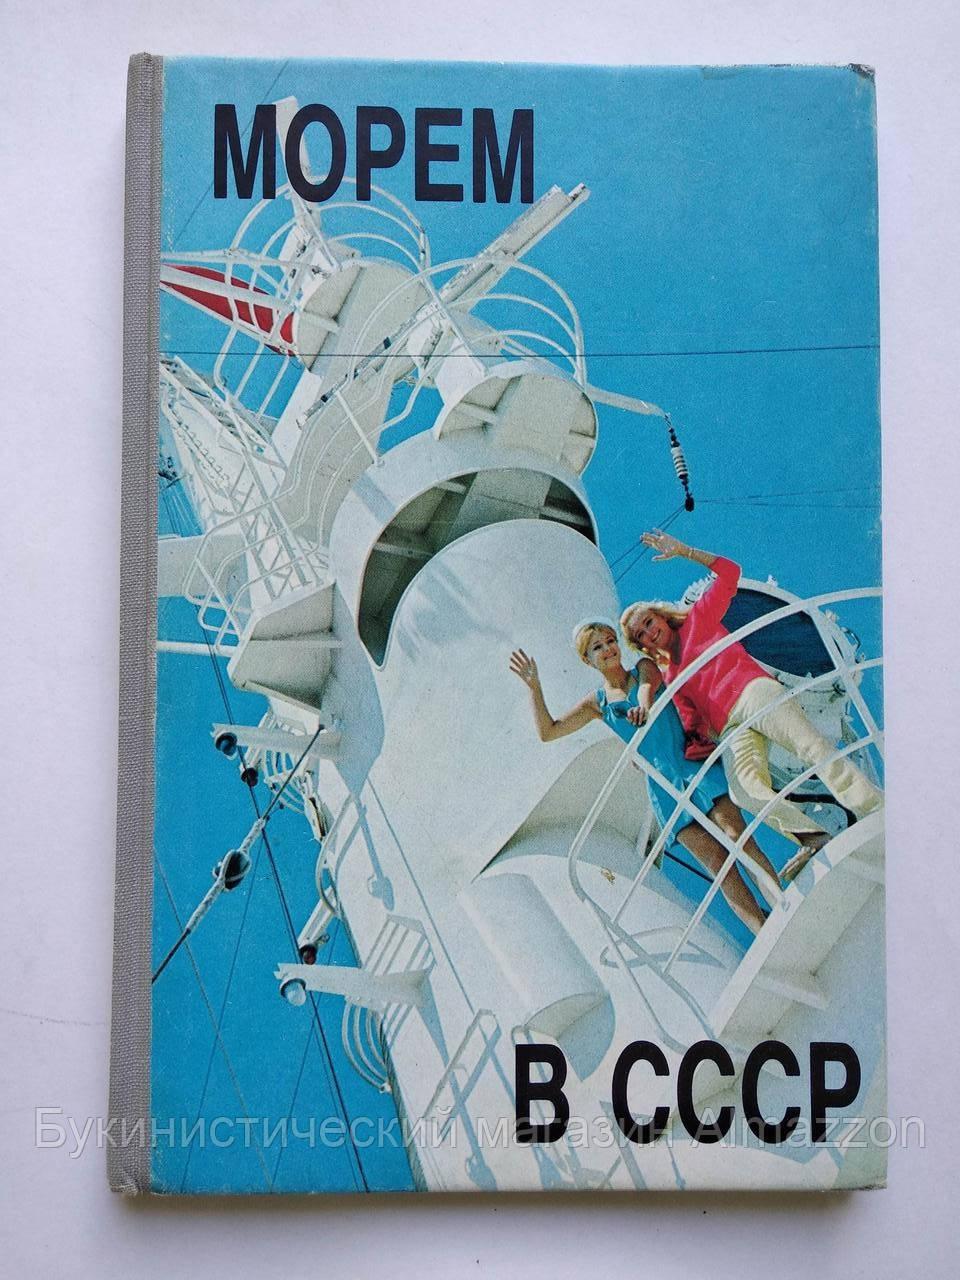 Морем в СССР. Реклама СССР. ЧМП. Морфлот